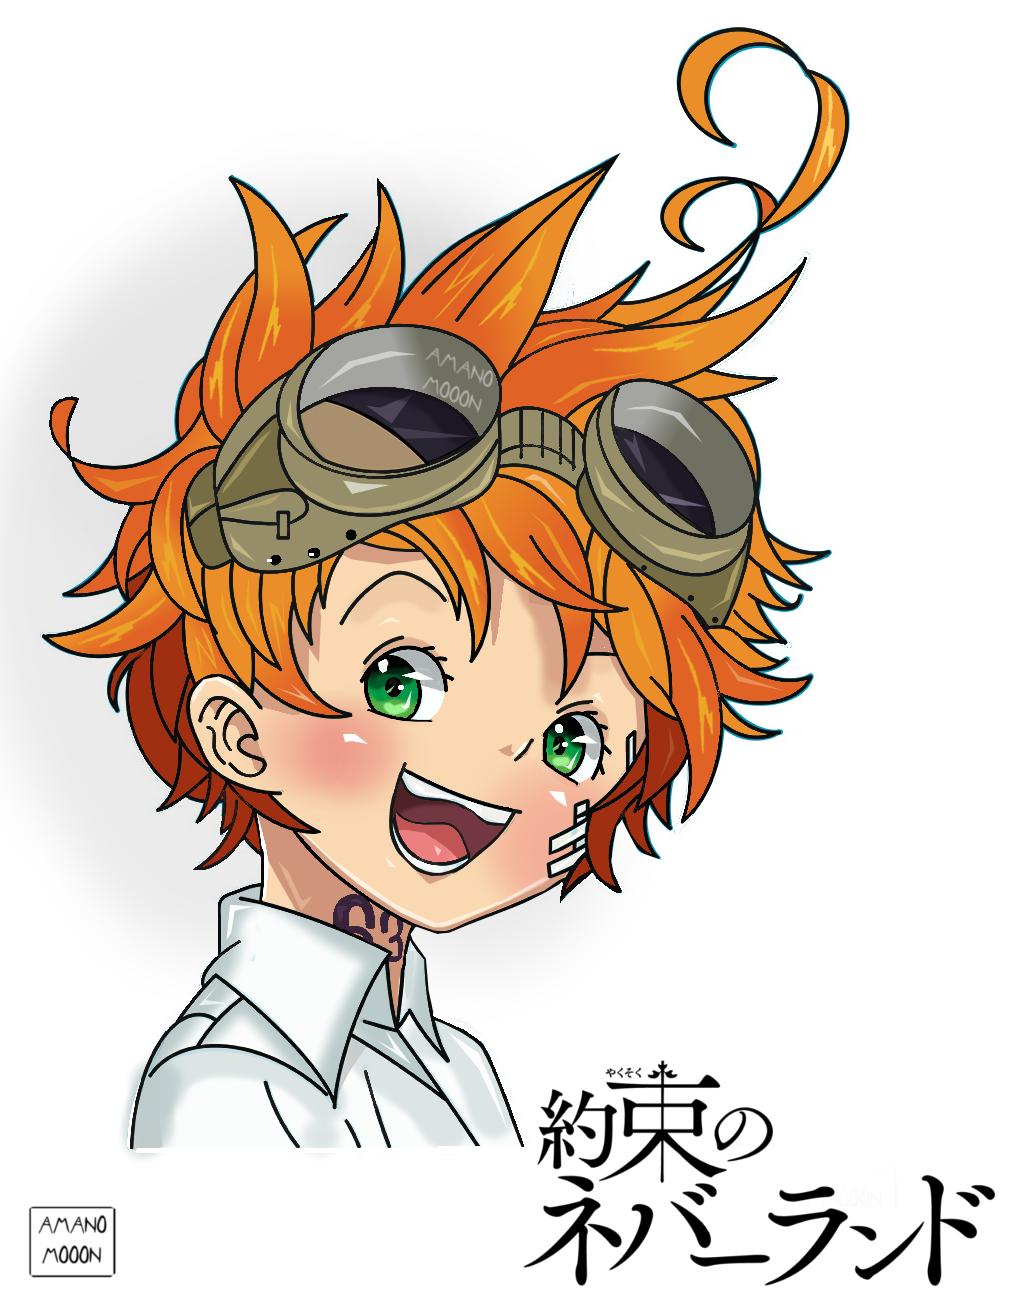 The Promised Neverland Emma Manga Colors Anime by Amanomoon